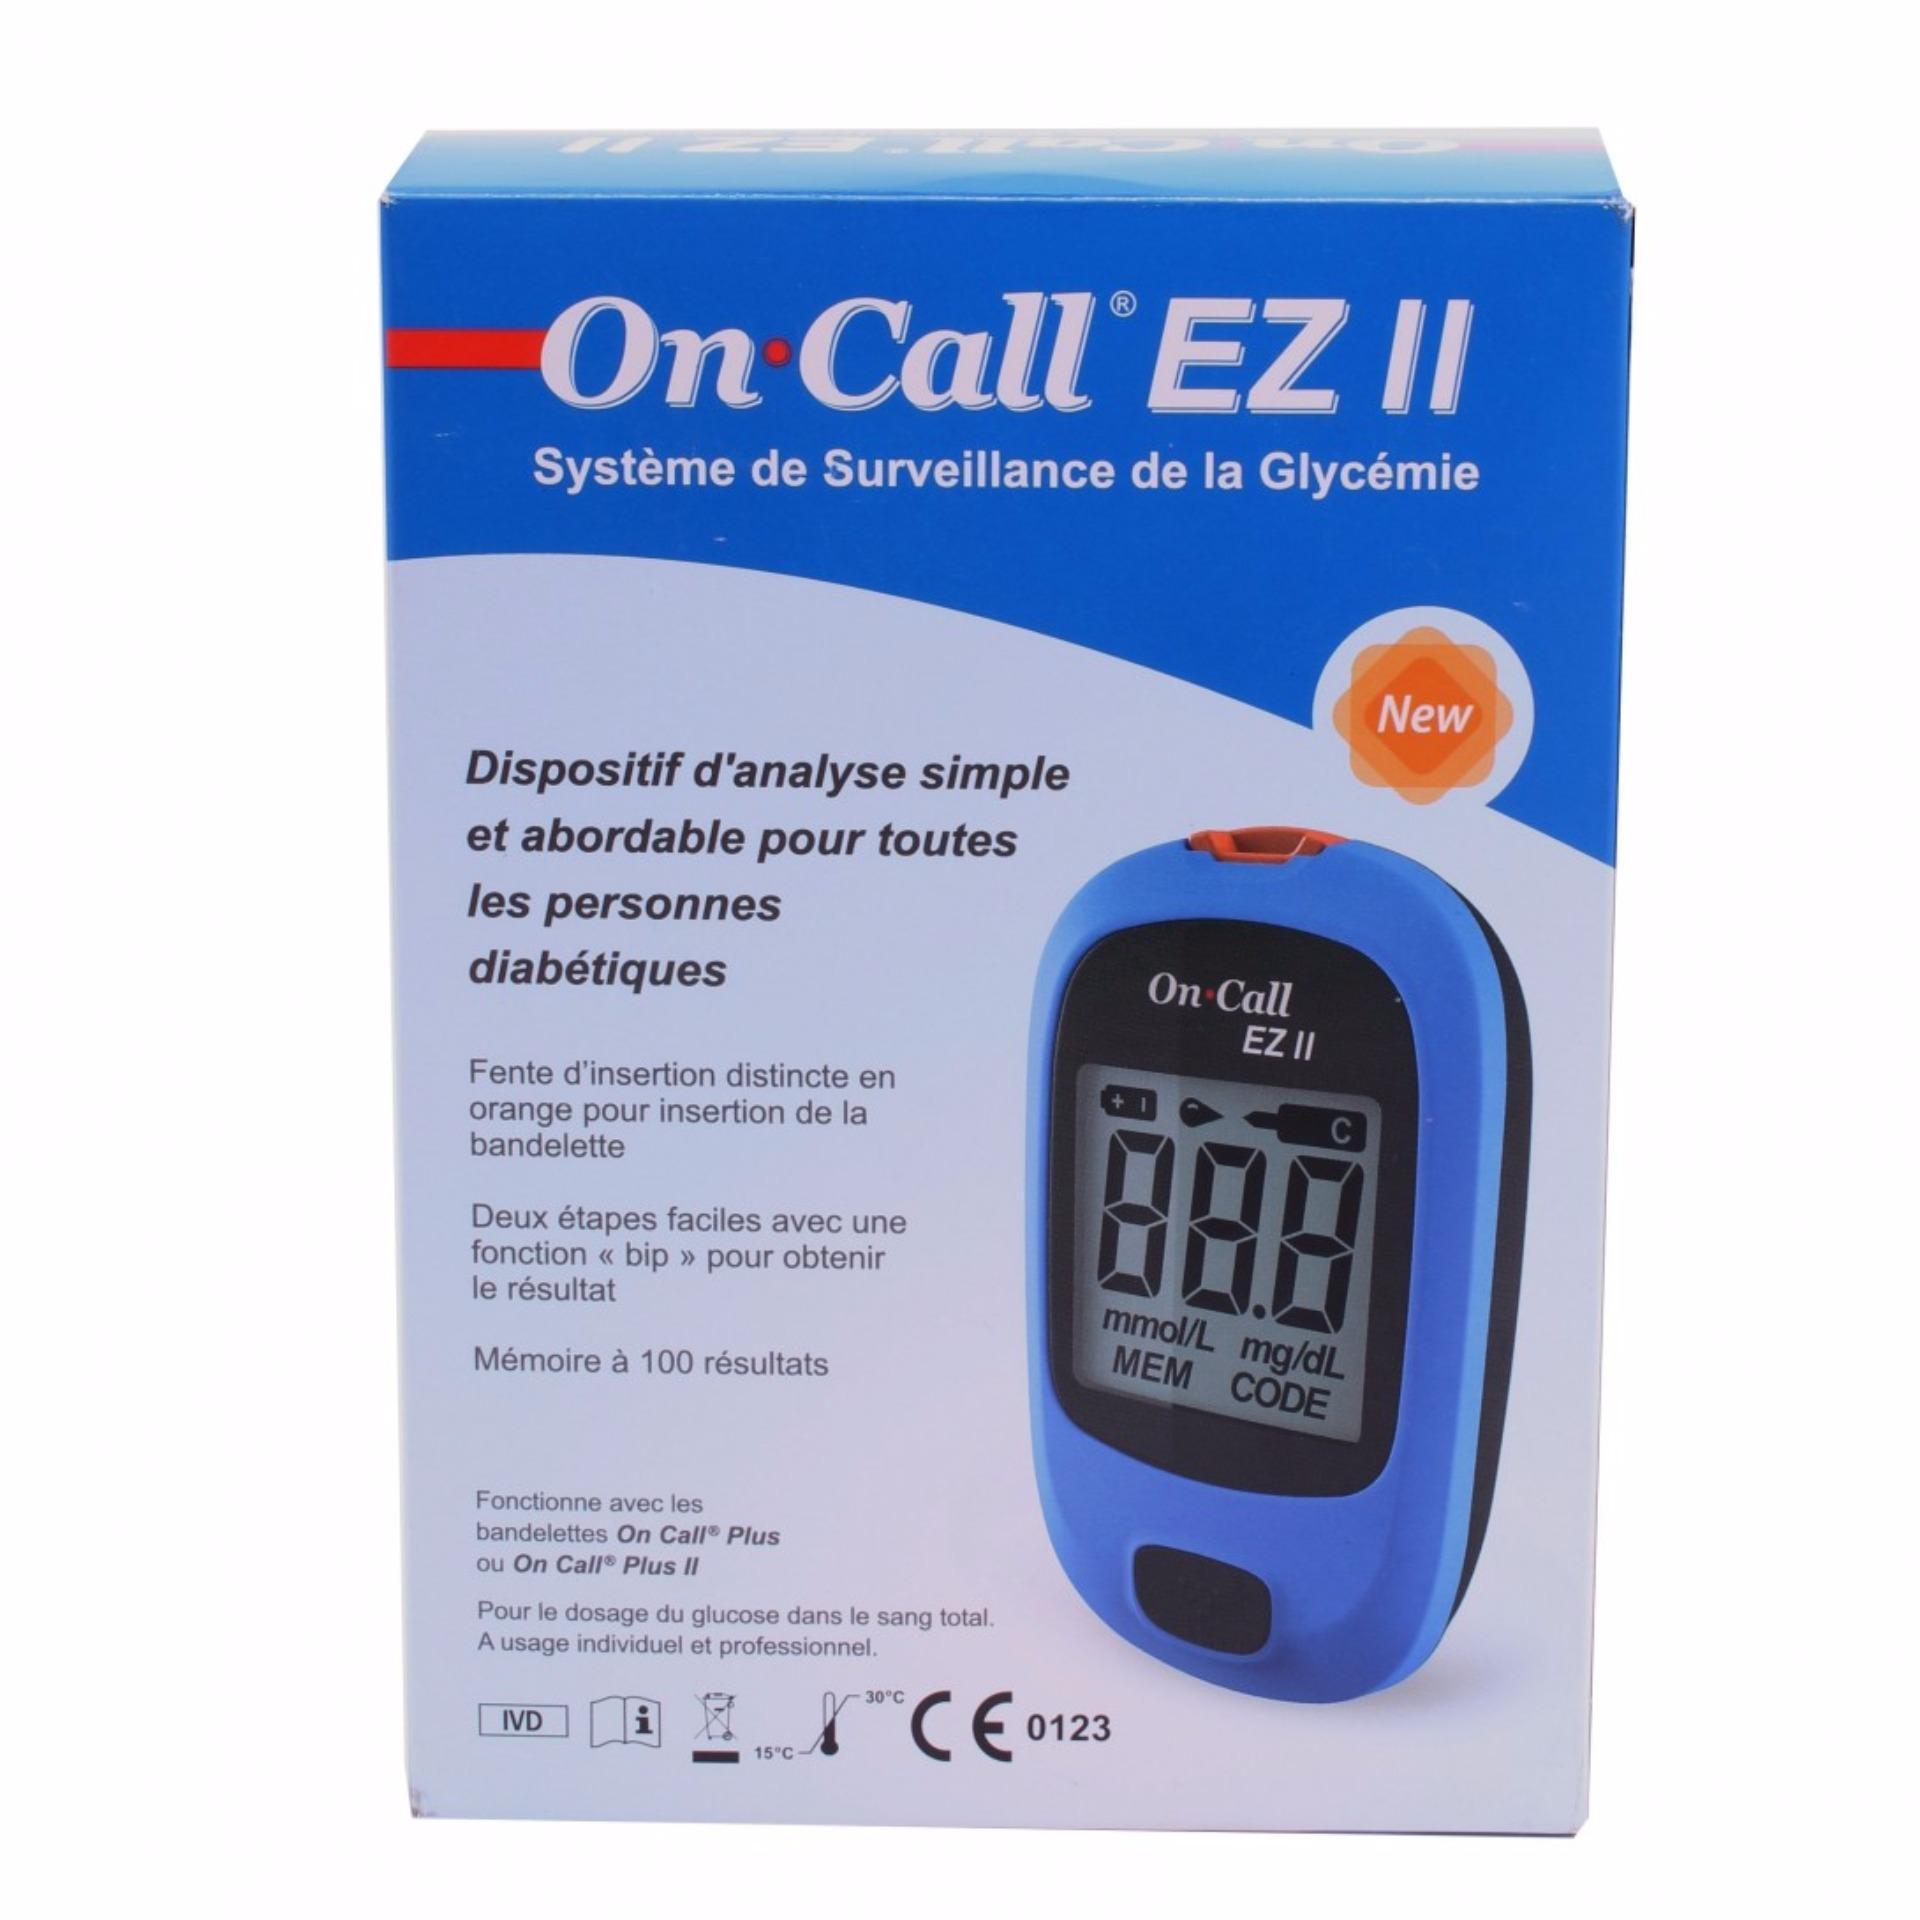 Harga Penawaran On Call Ez Ii Alat Cek Gula Darah Easy Touch Gcu Tes Diabetes Autocheck 3 In 1